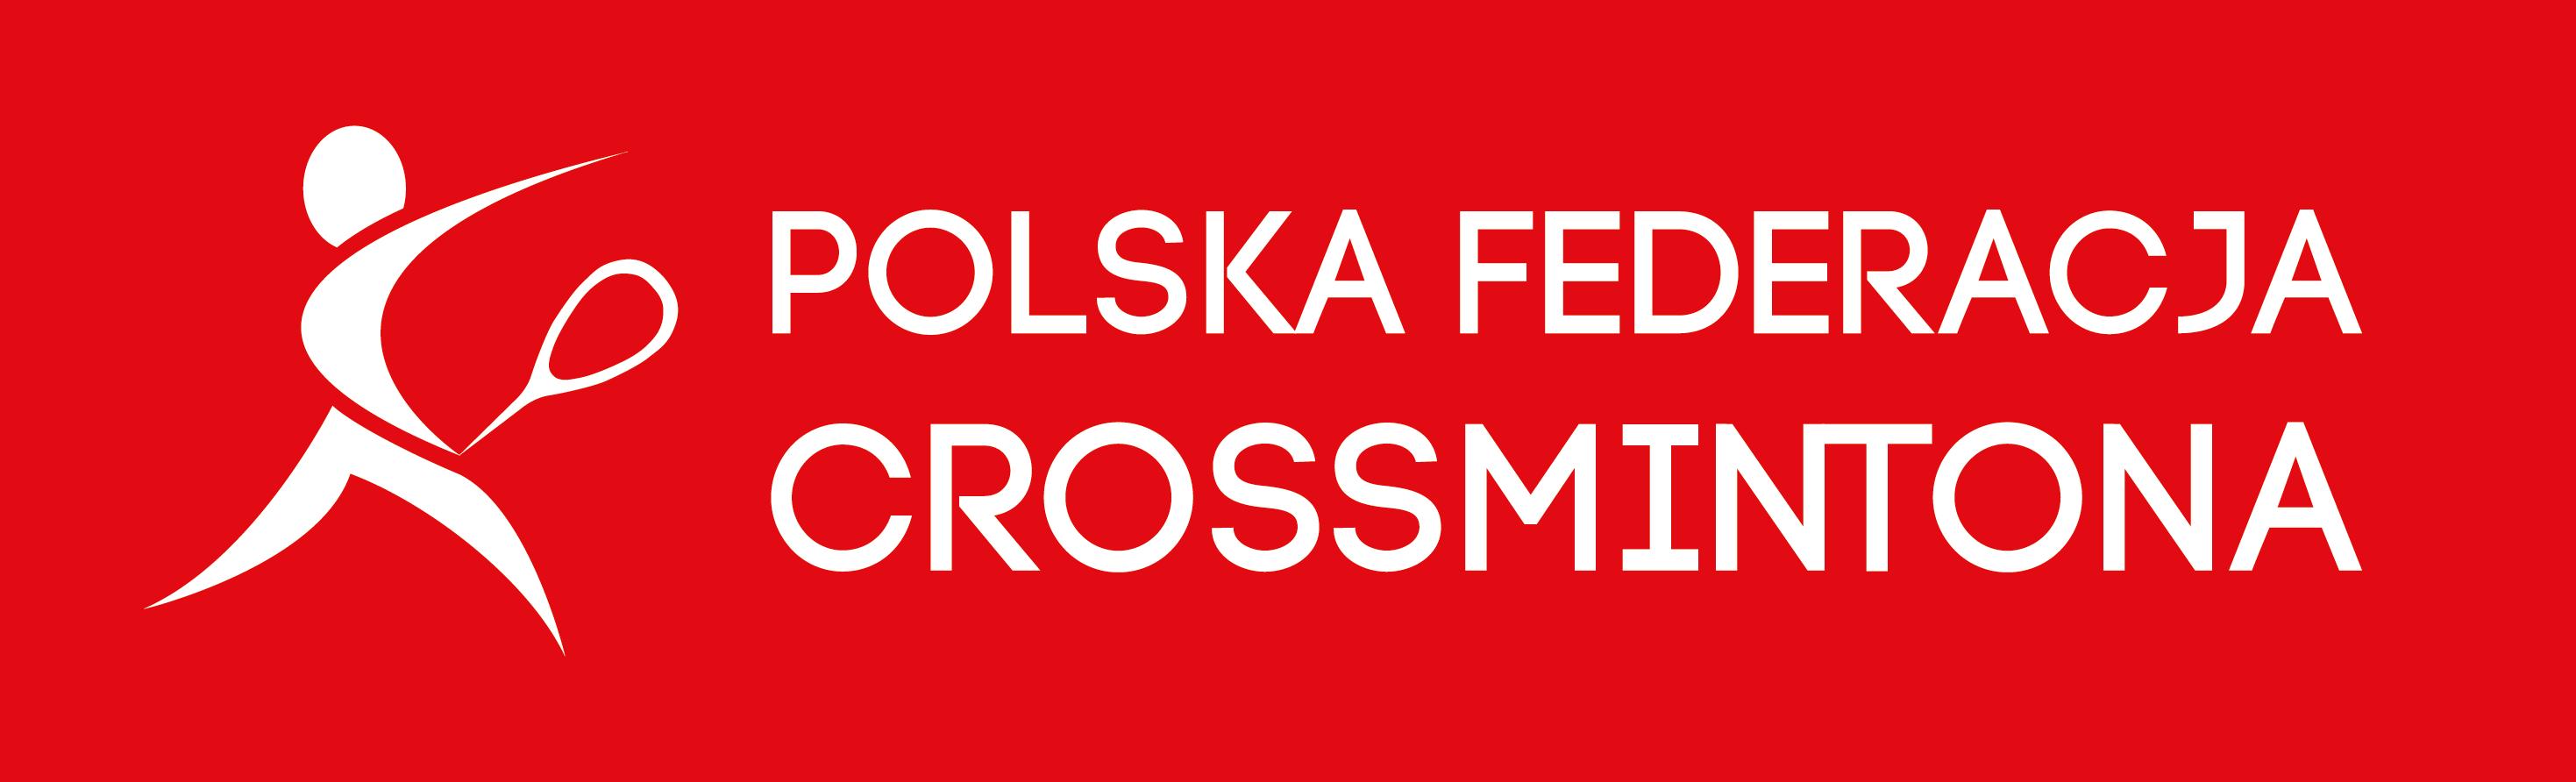 pfc_logo_prostokat_bezramki